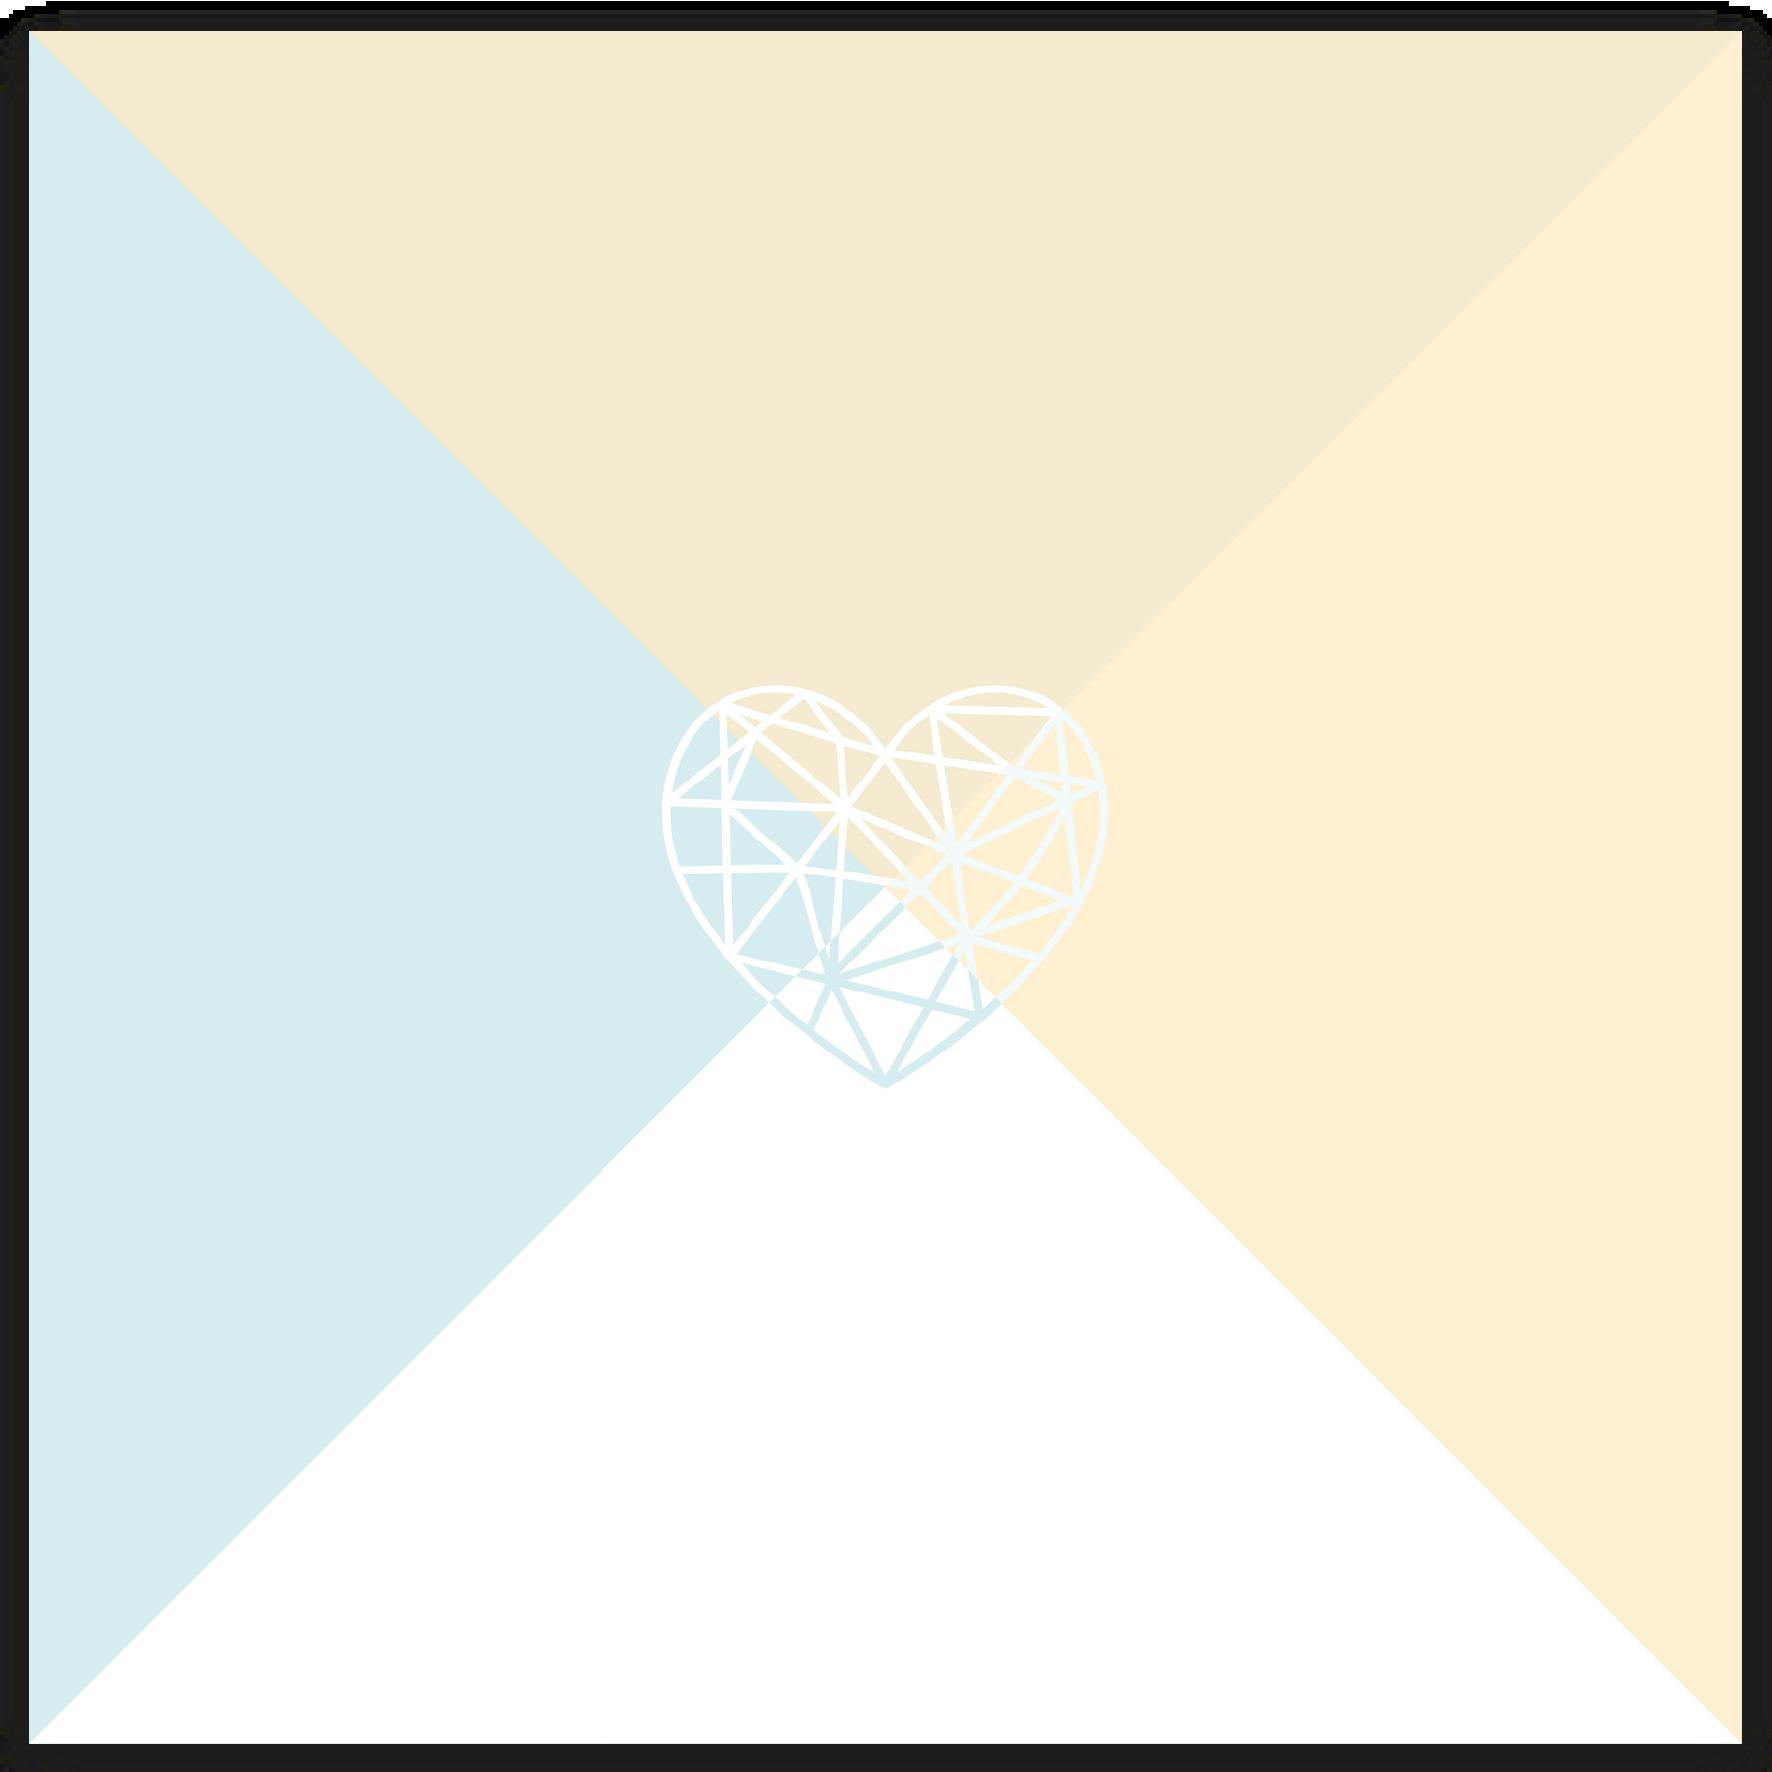 tackkort till bröllop Soft Blue and yellow_Tackkort_bröllop_150x150